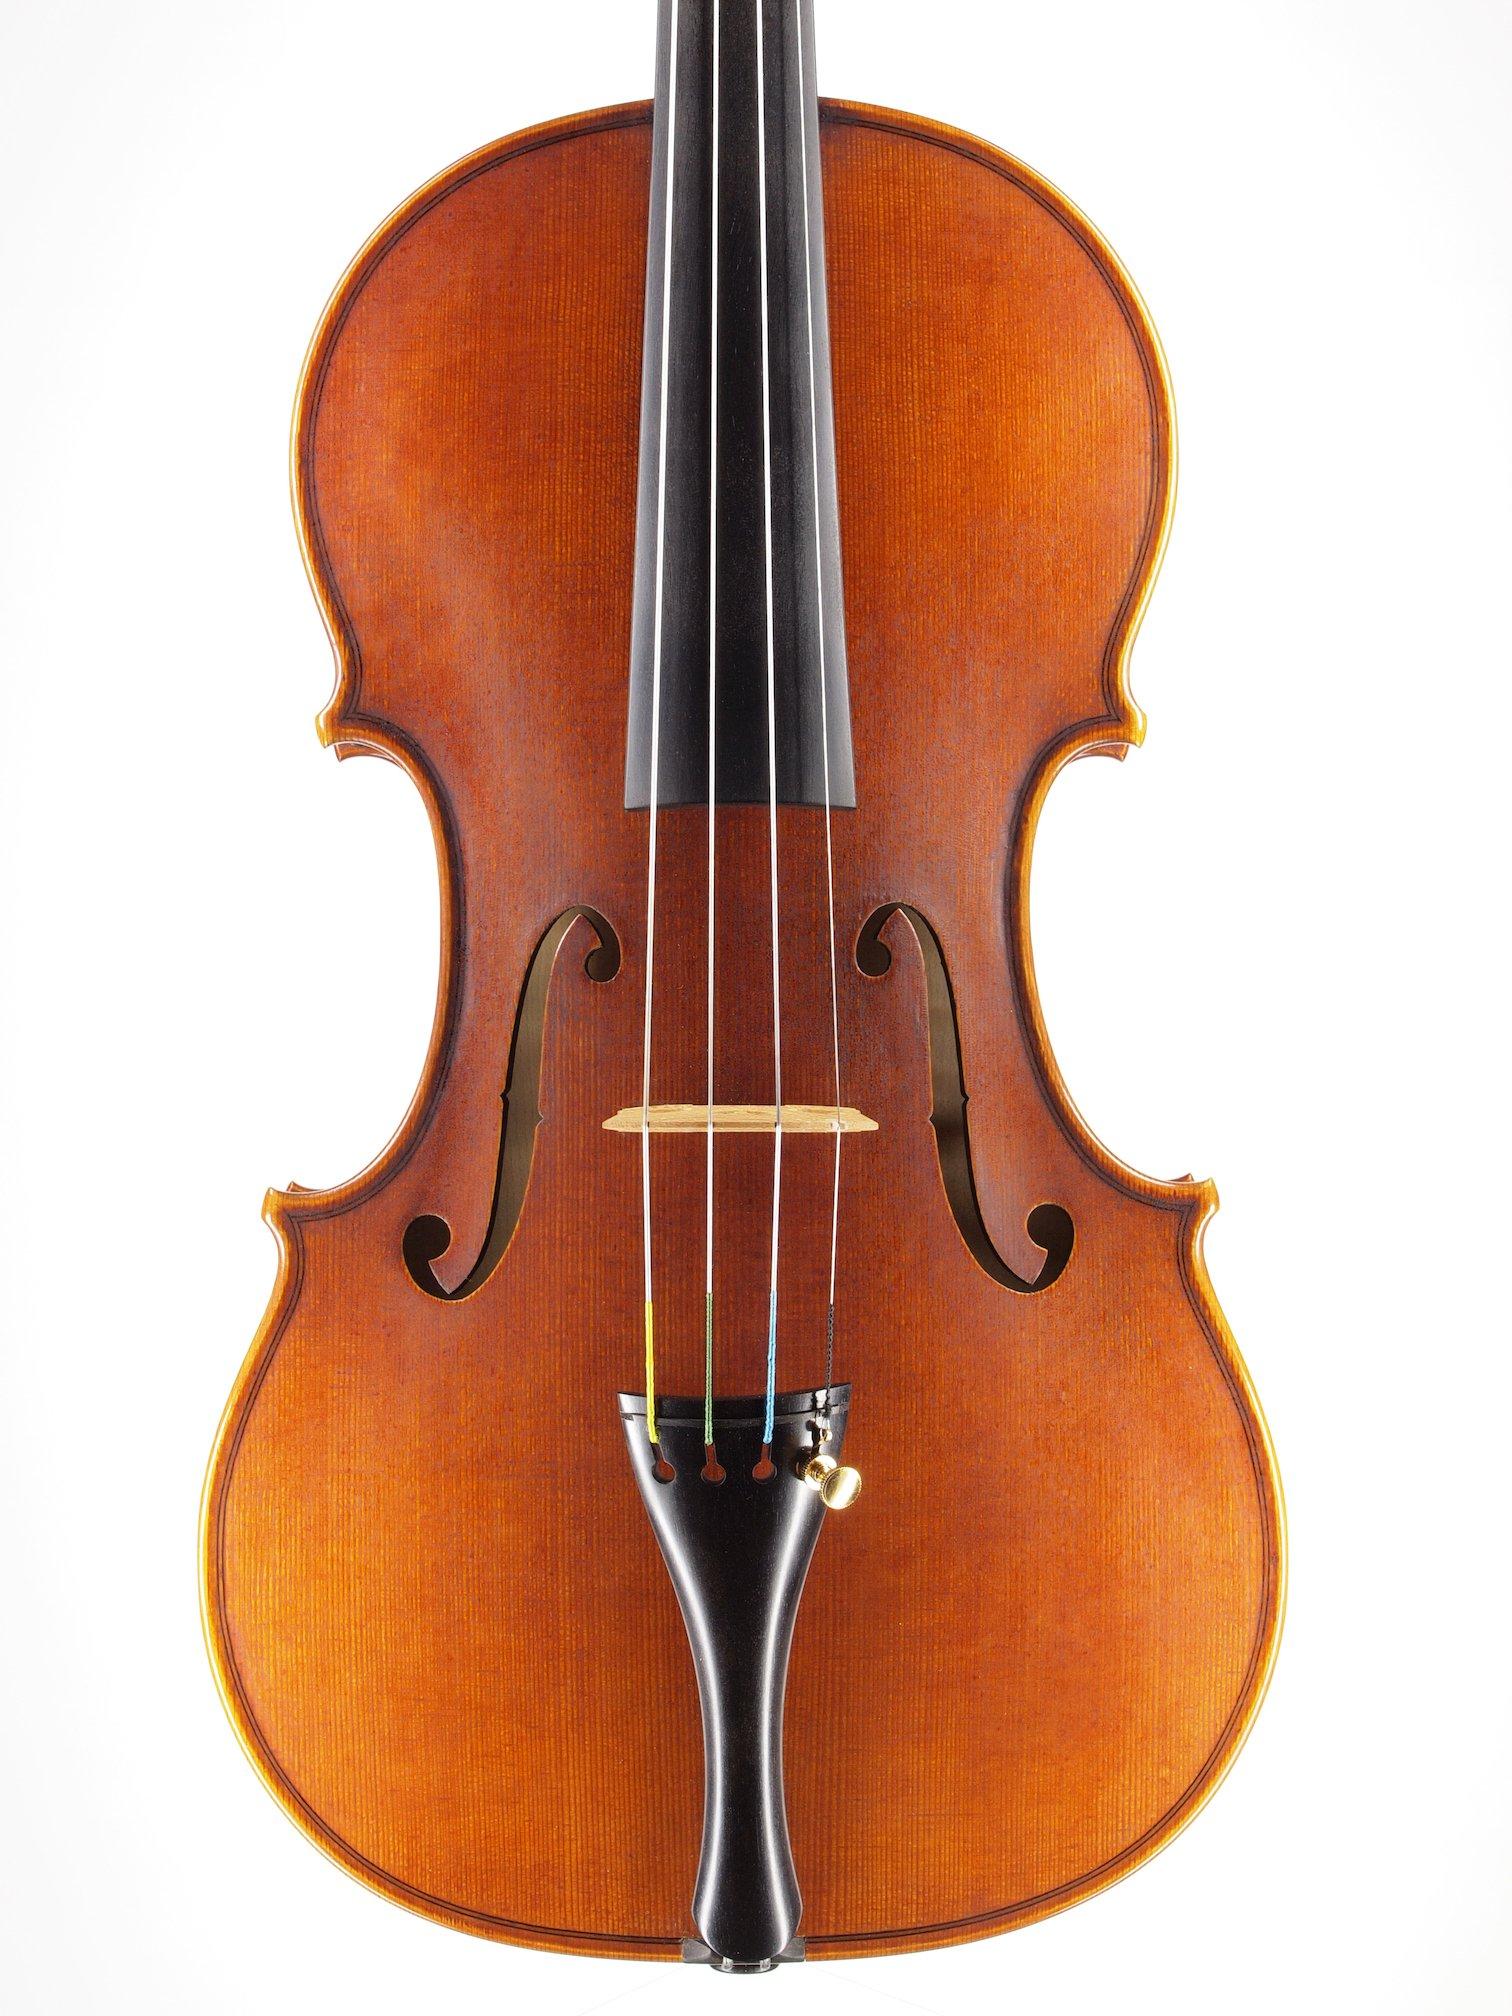 Violin based on the model of the 'Sauret' Guarneri del Gesu anno 1743 III